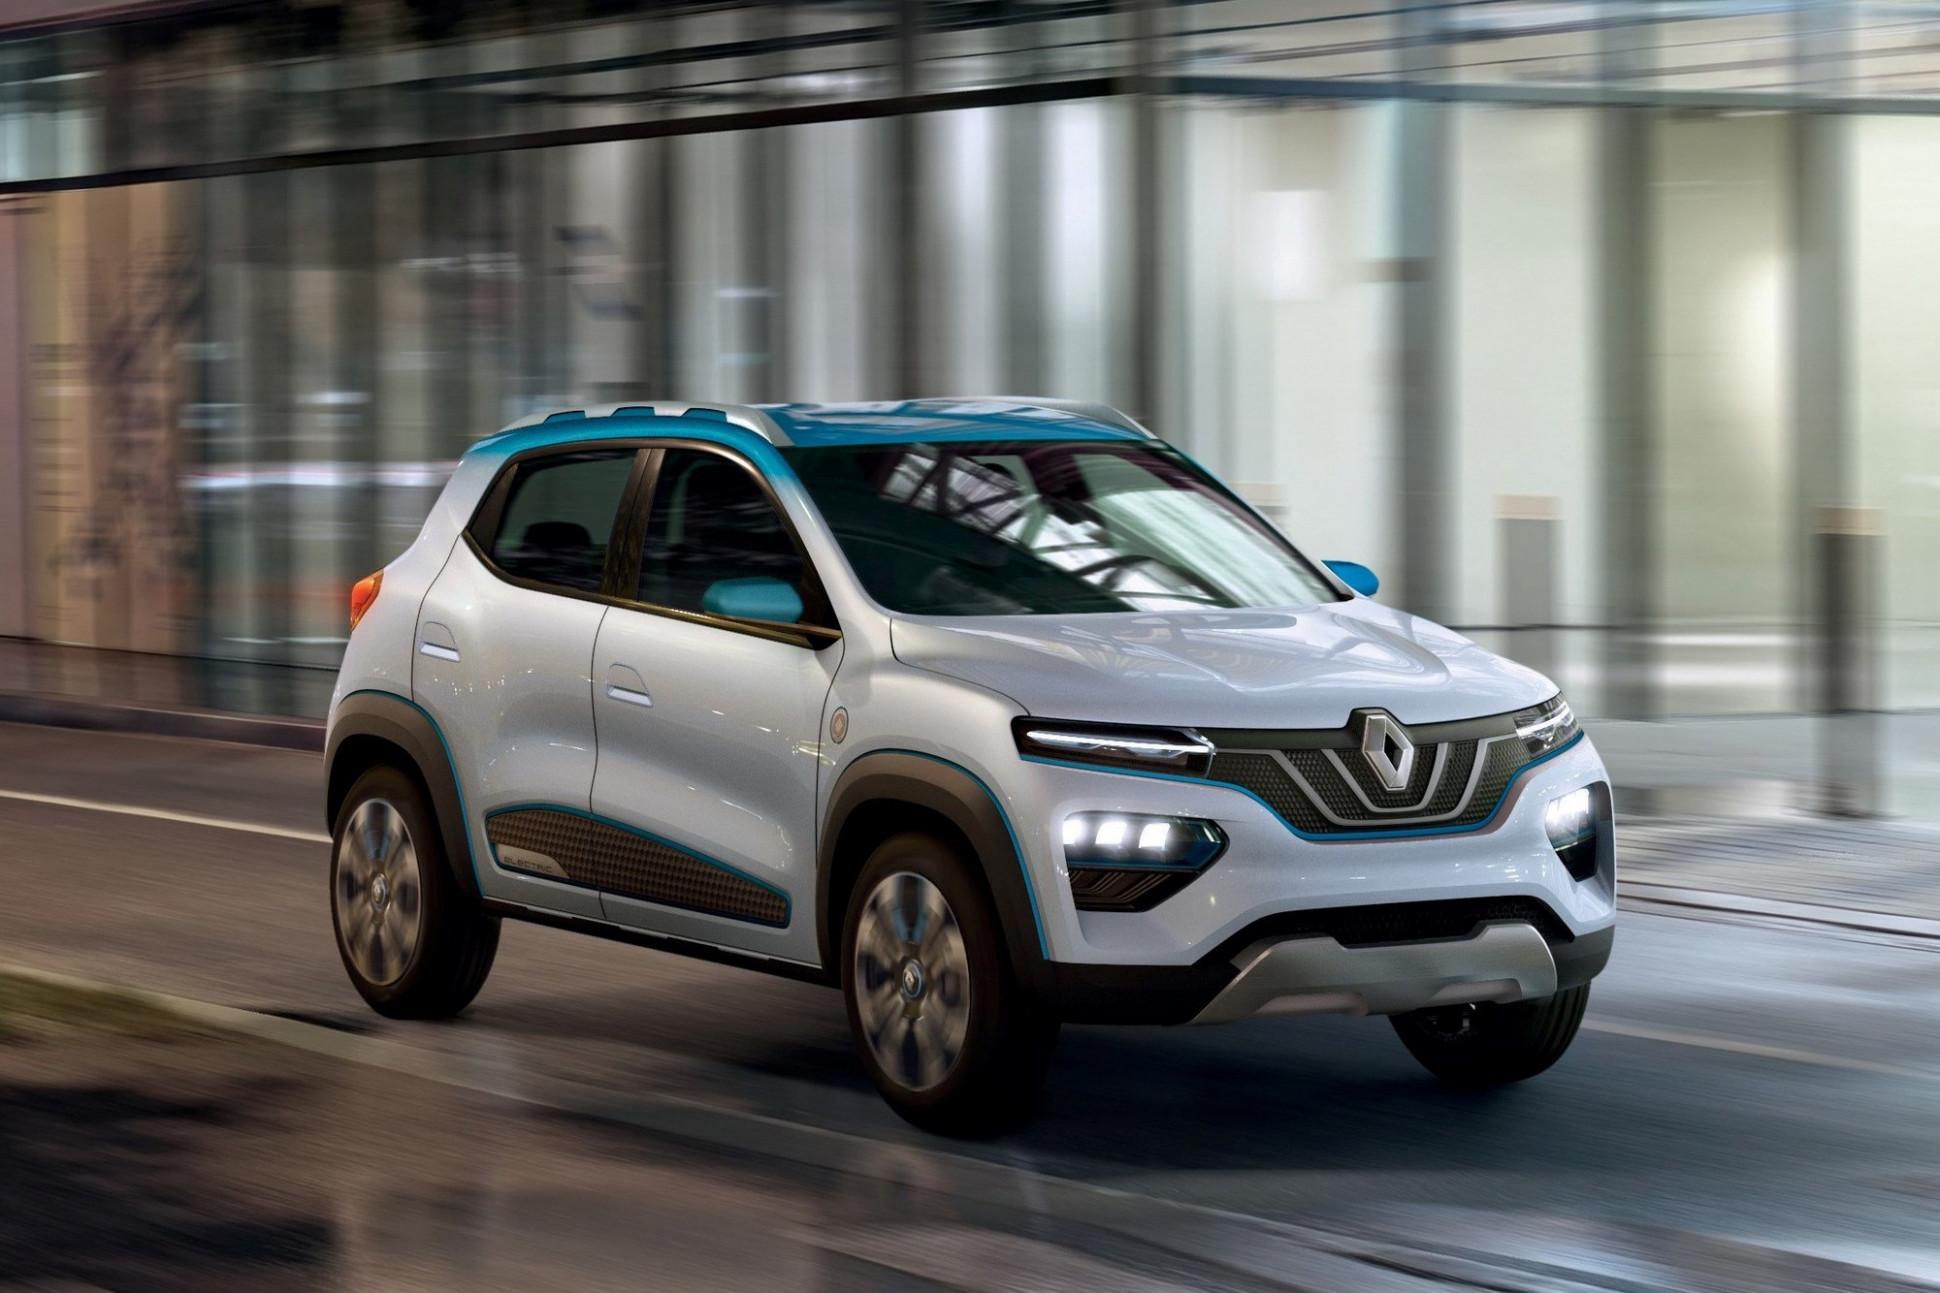 Exterior 2022 Renault Kadjar